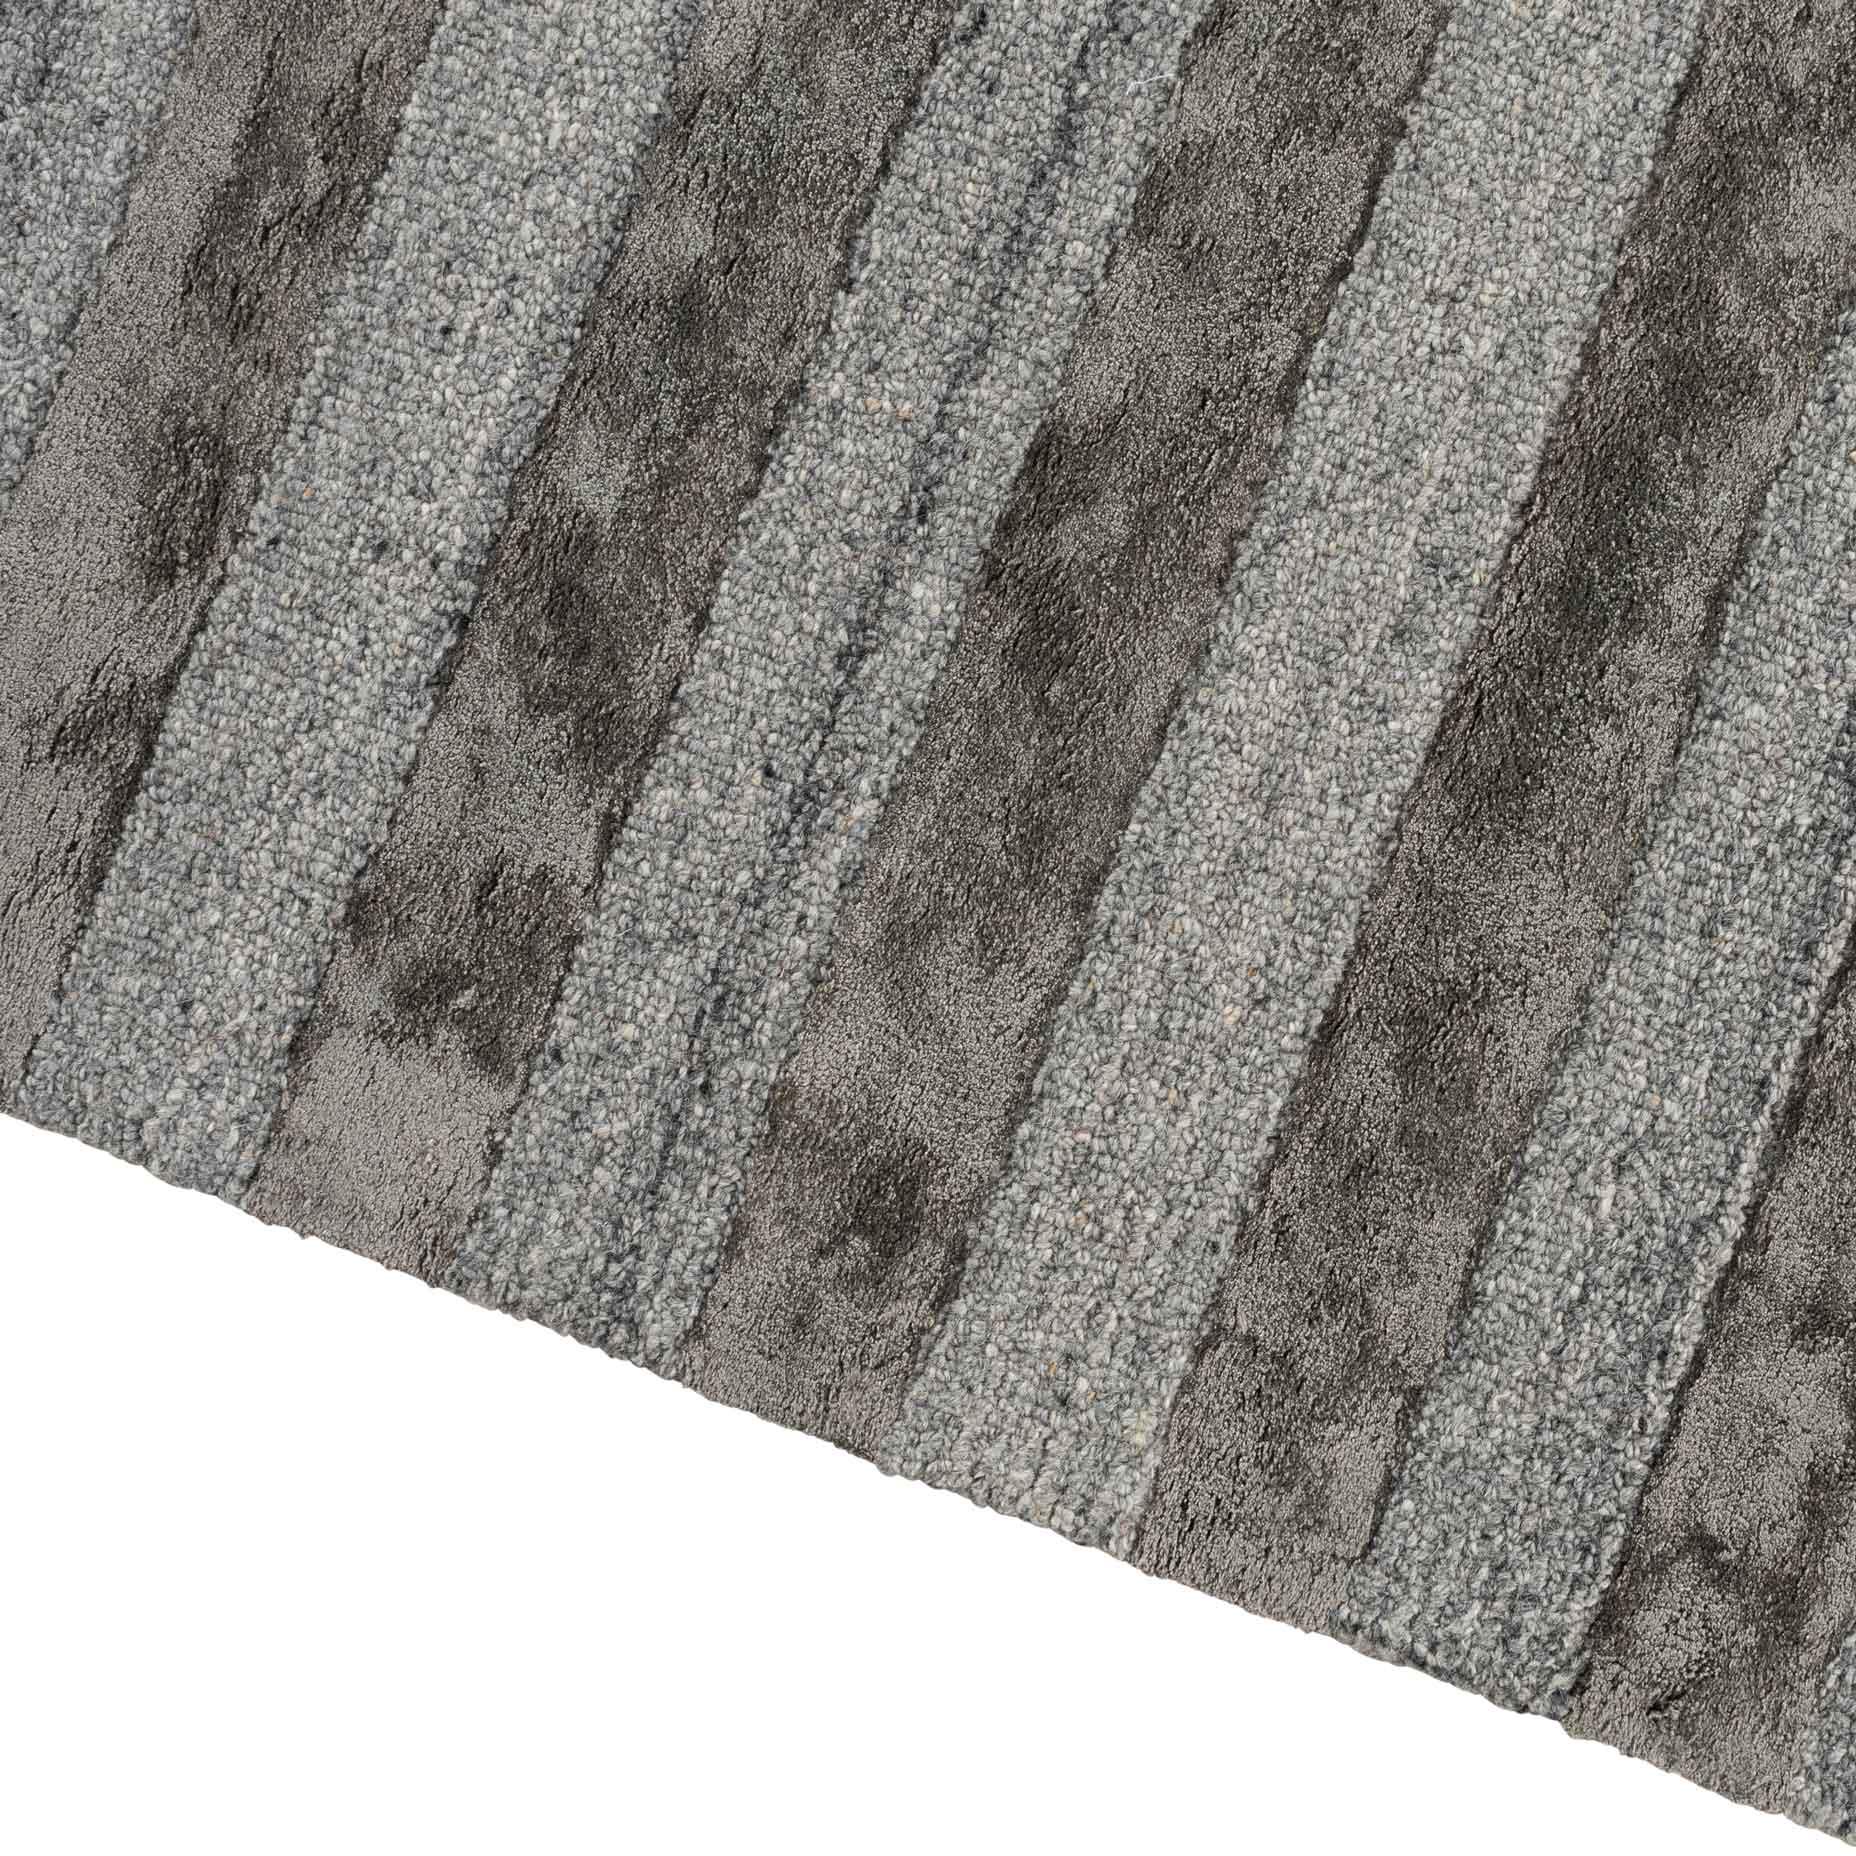 Shimmer-Lines-Charccoal_edge